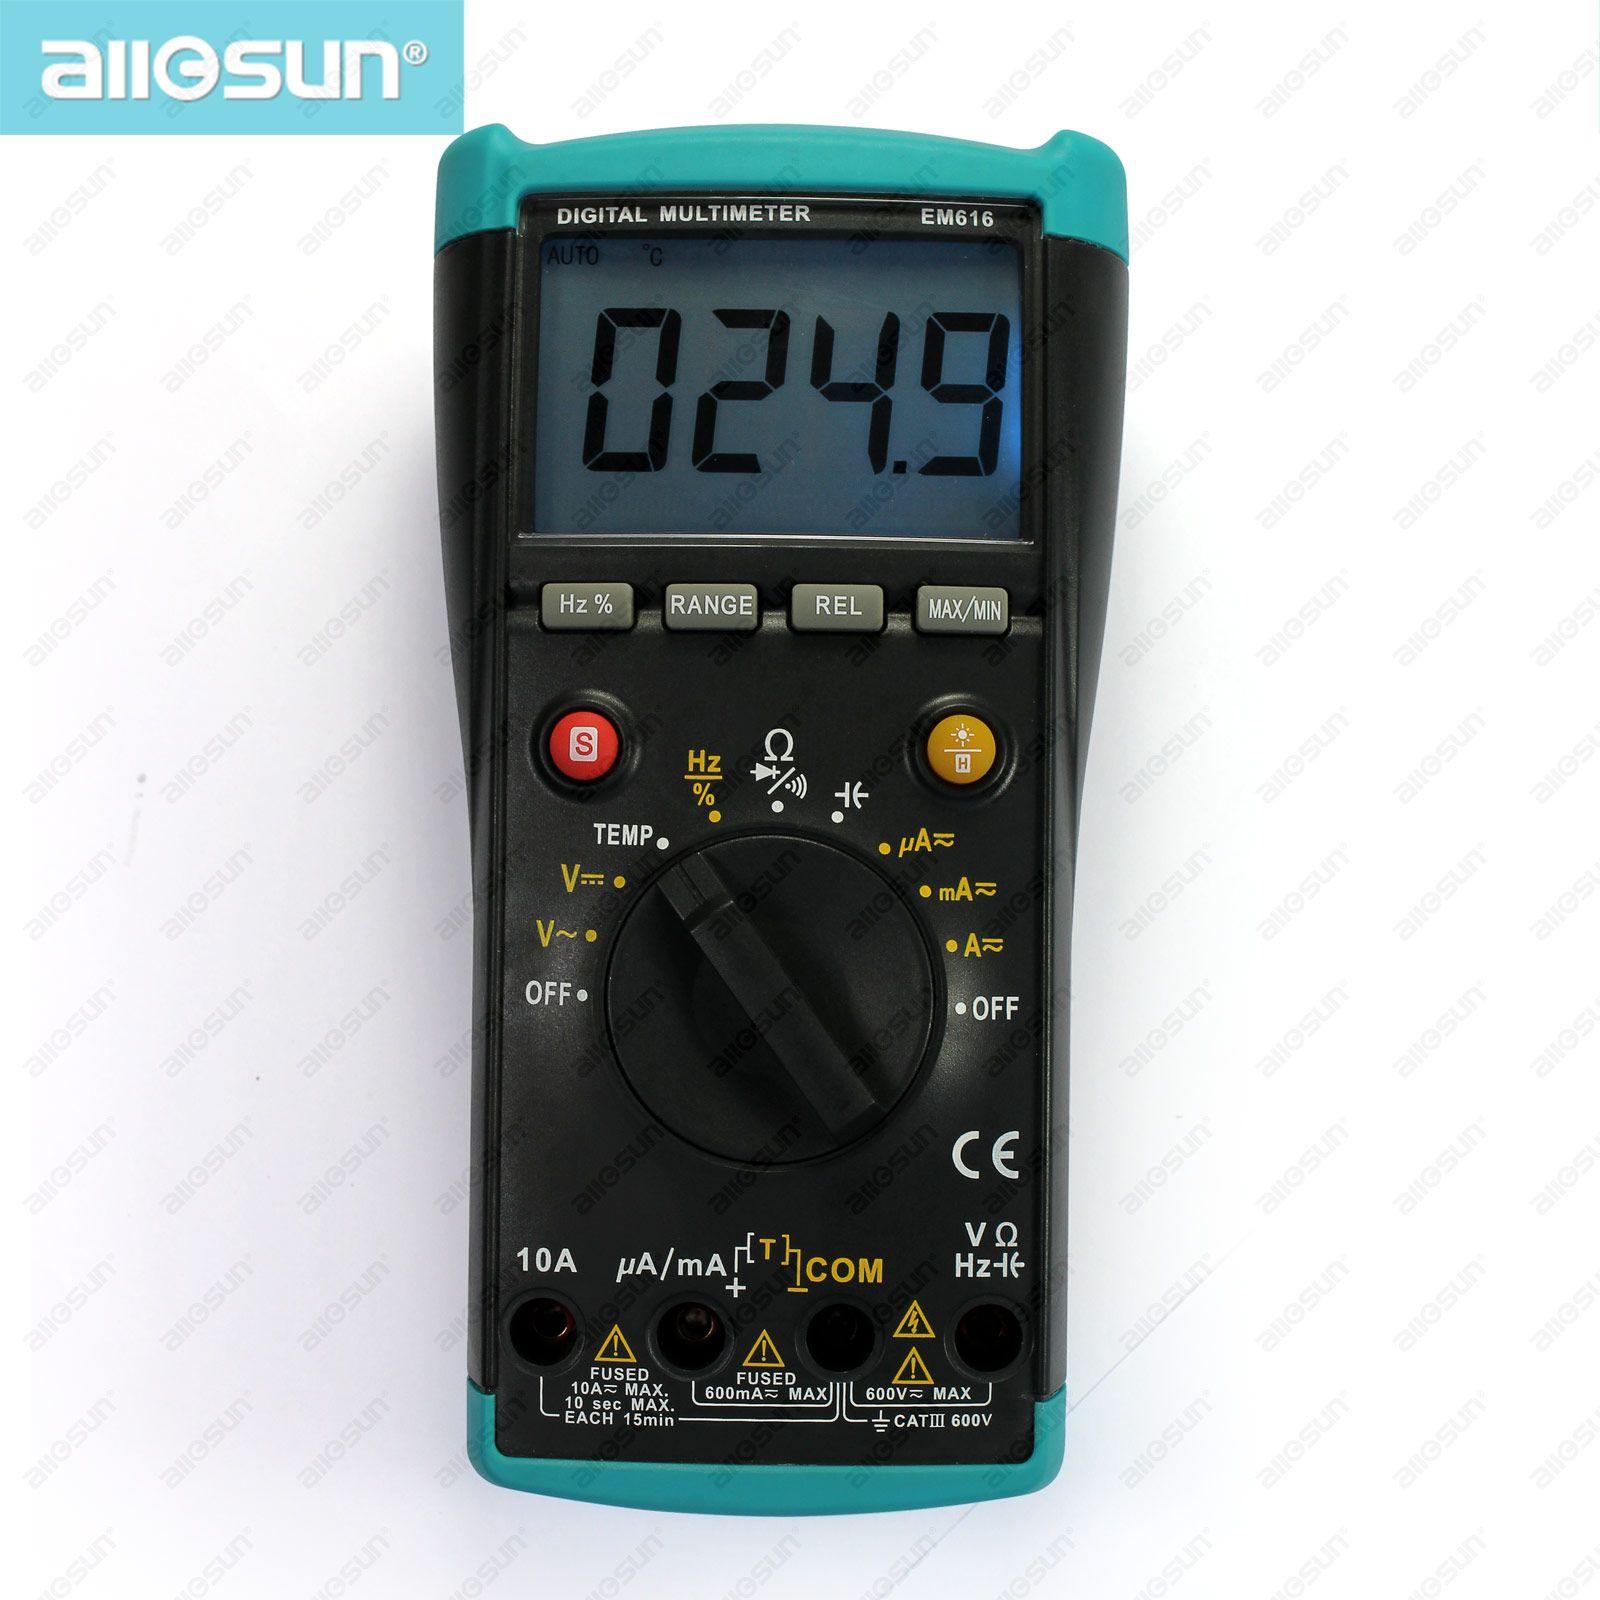 Digitale Auto Range Multimeter LCD-Digital-Display-CAT III 600 V Volt-Ohm-Meter All Sun EM616